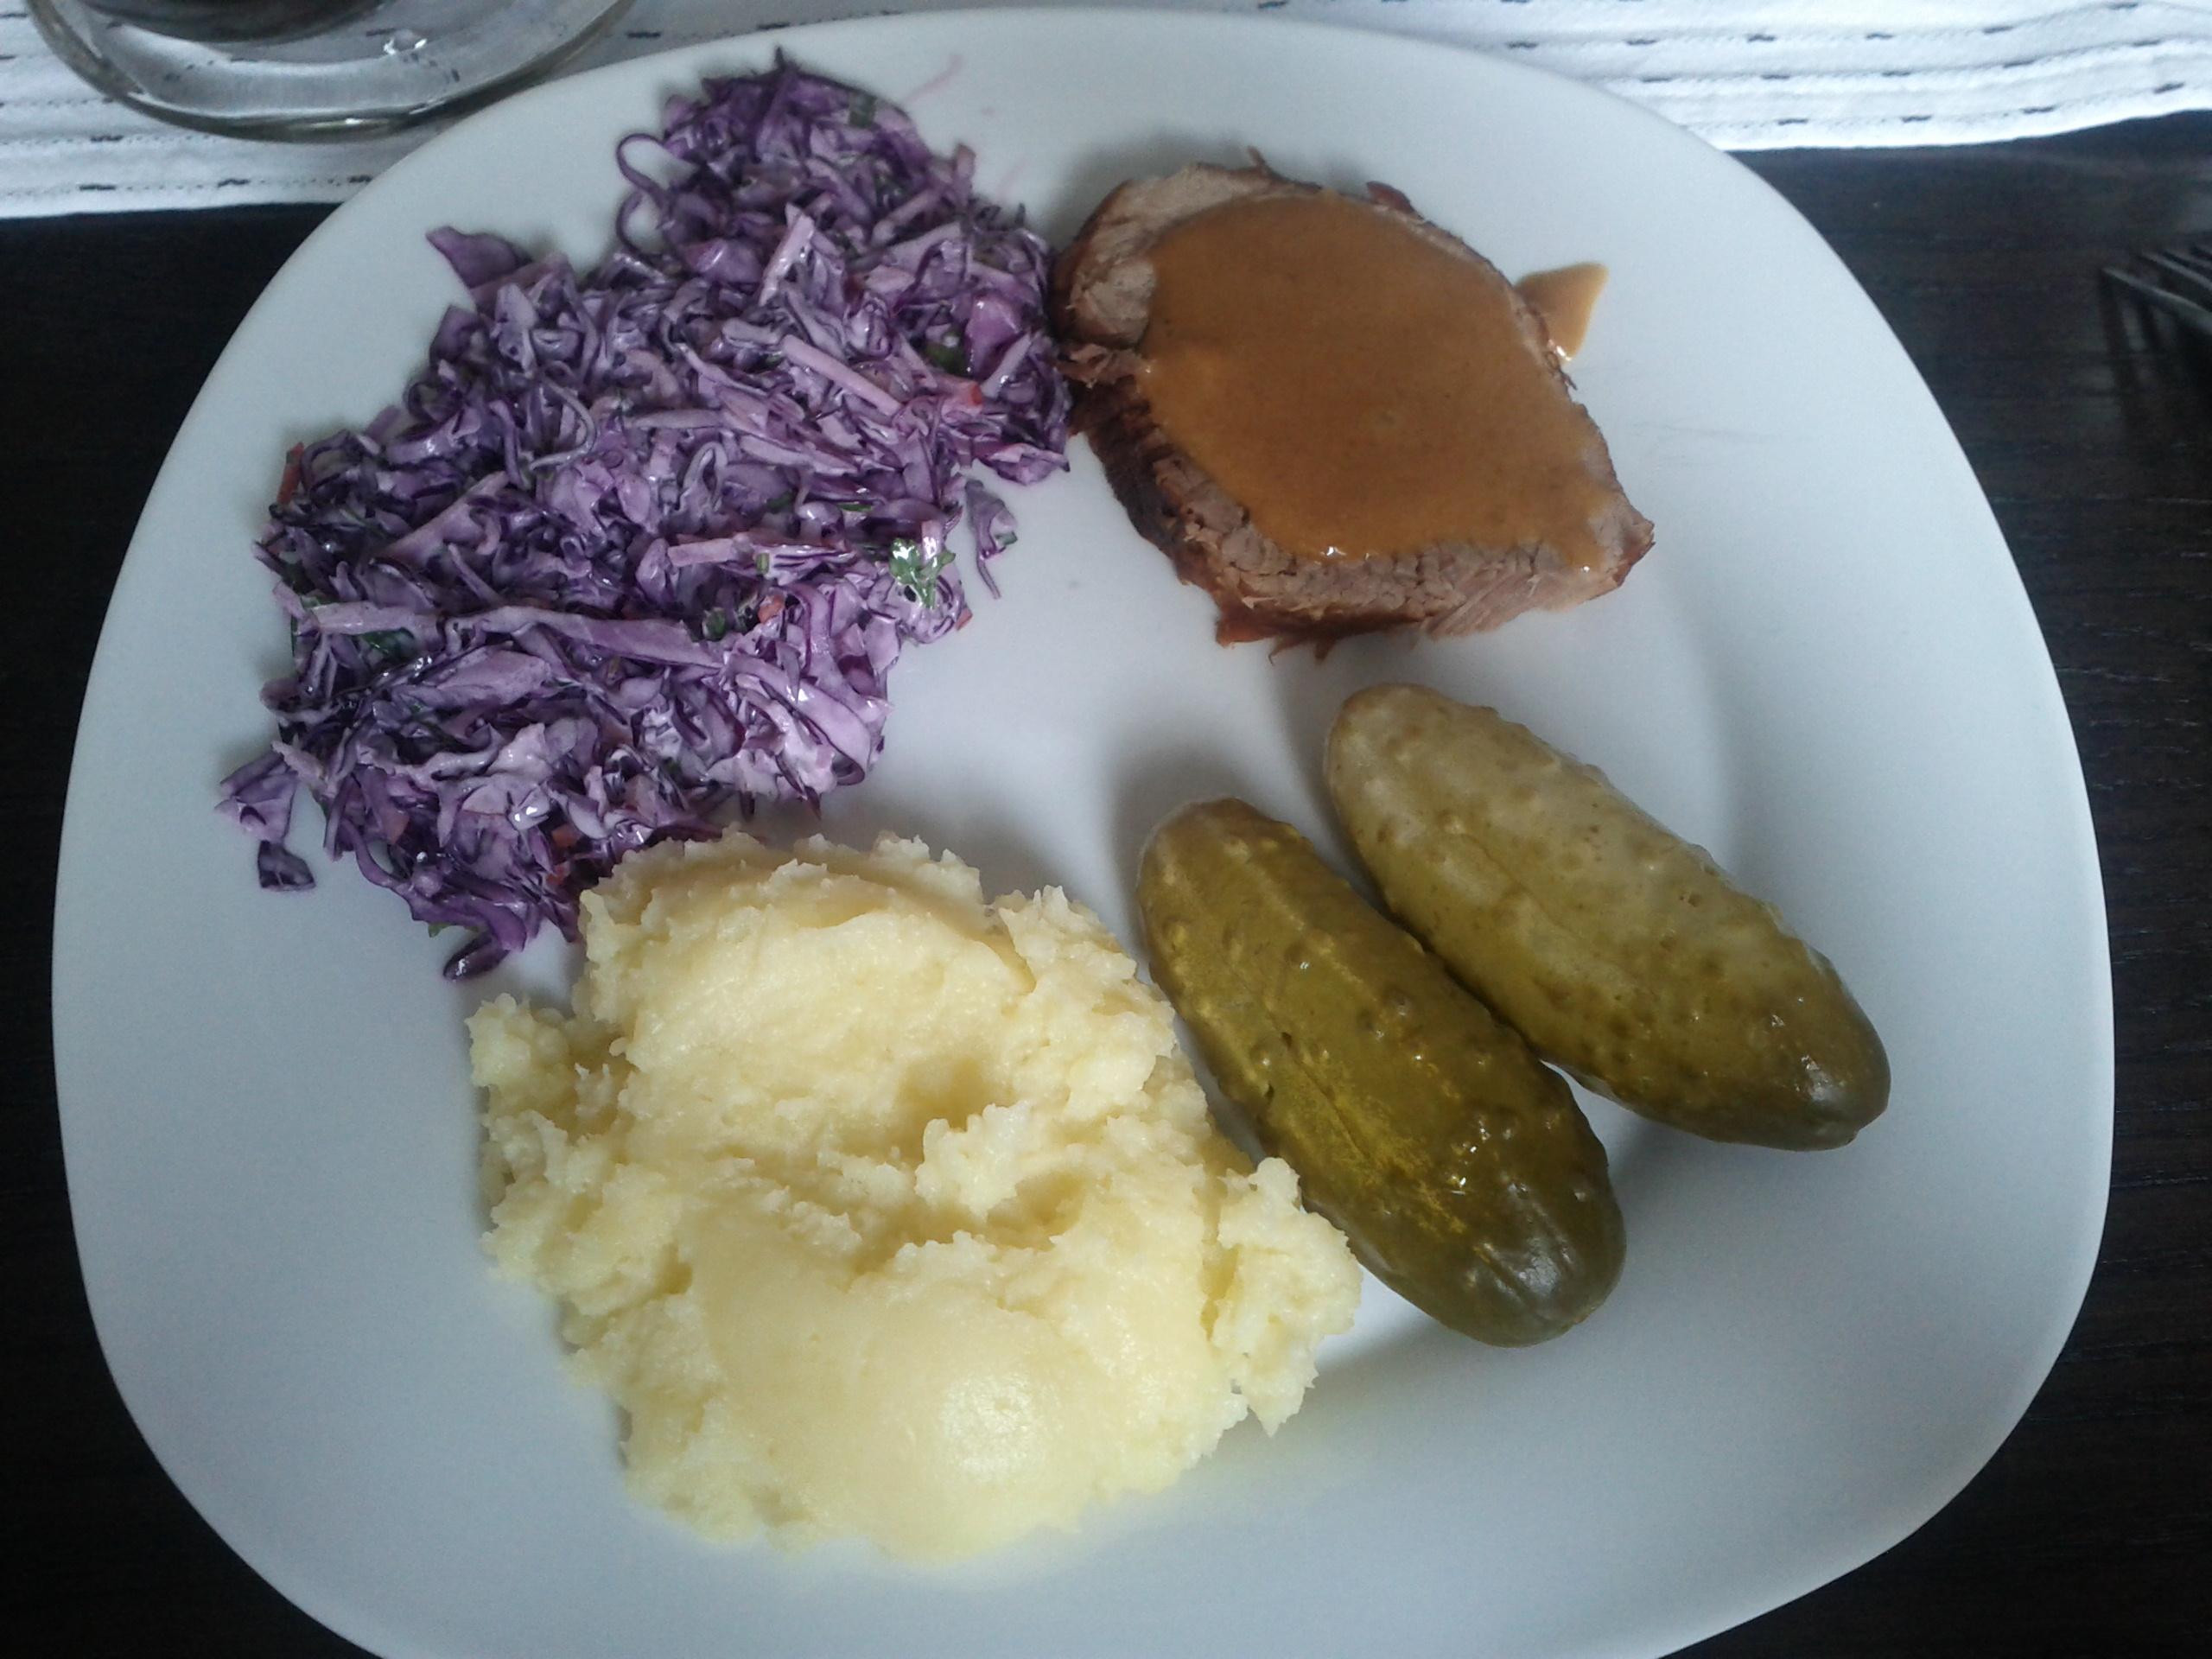 https://foodloader.net/bl1nk_2012-08-26_Braten__Kartoffeln__Kraut_und_Gurken.jpg